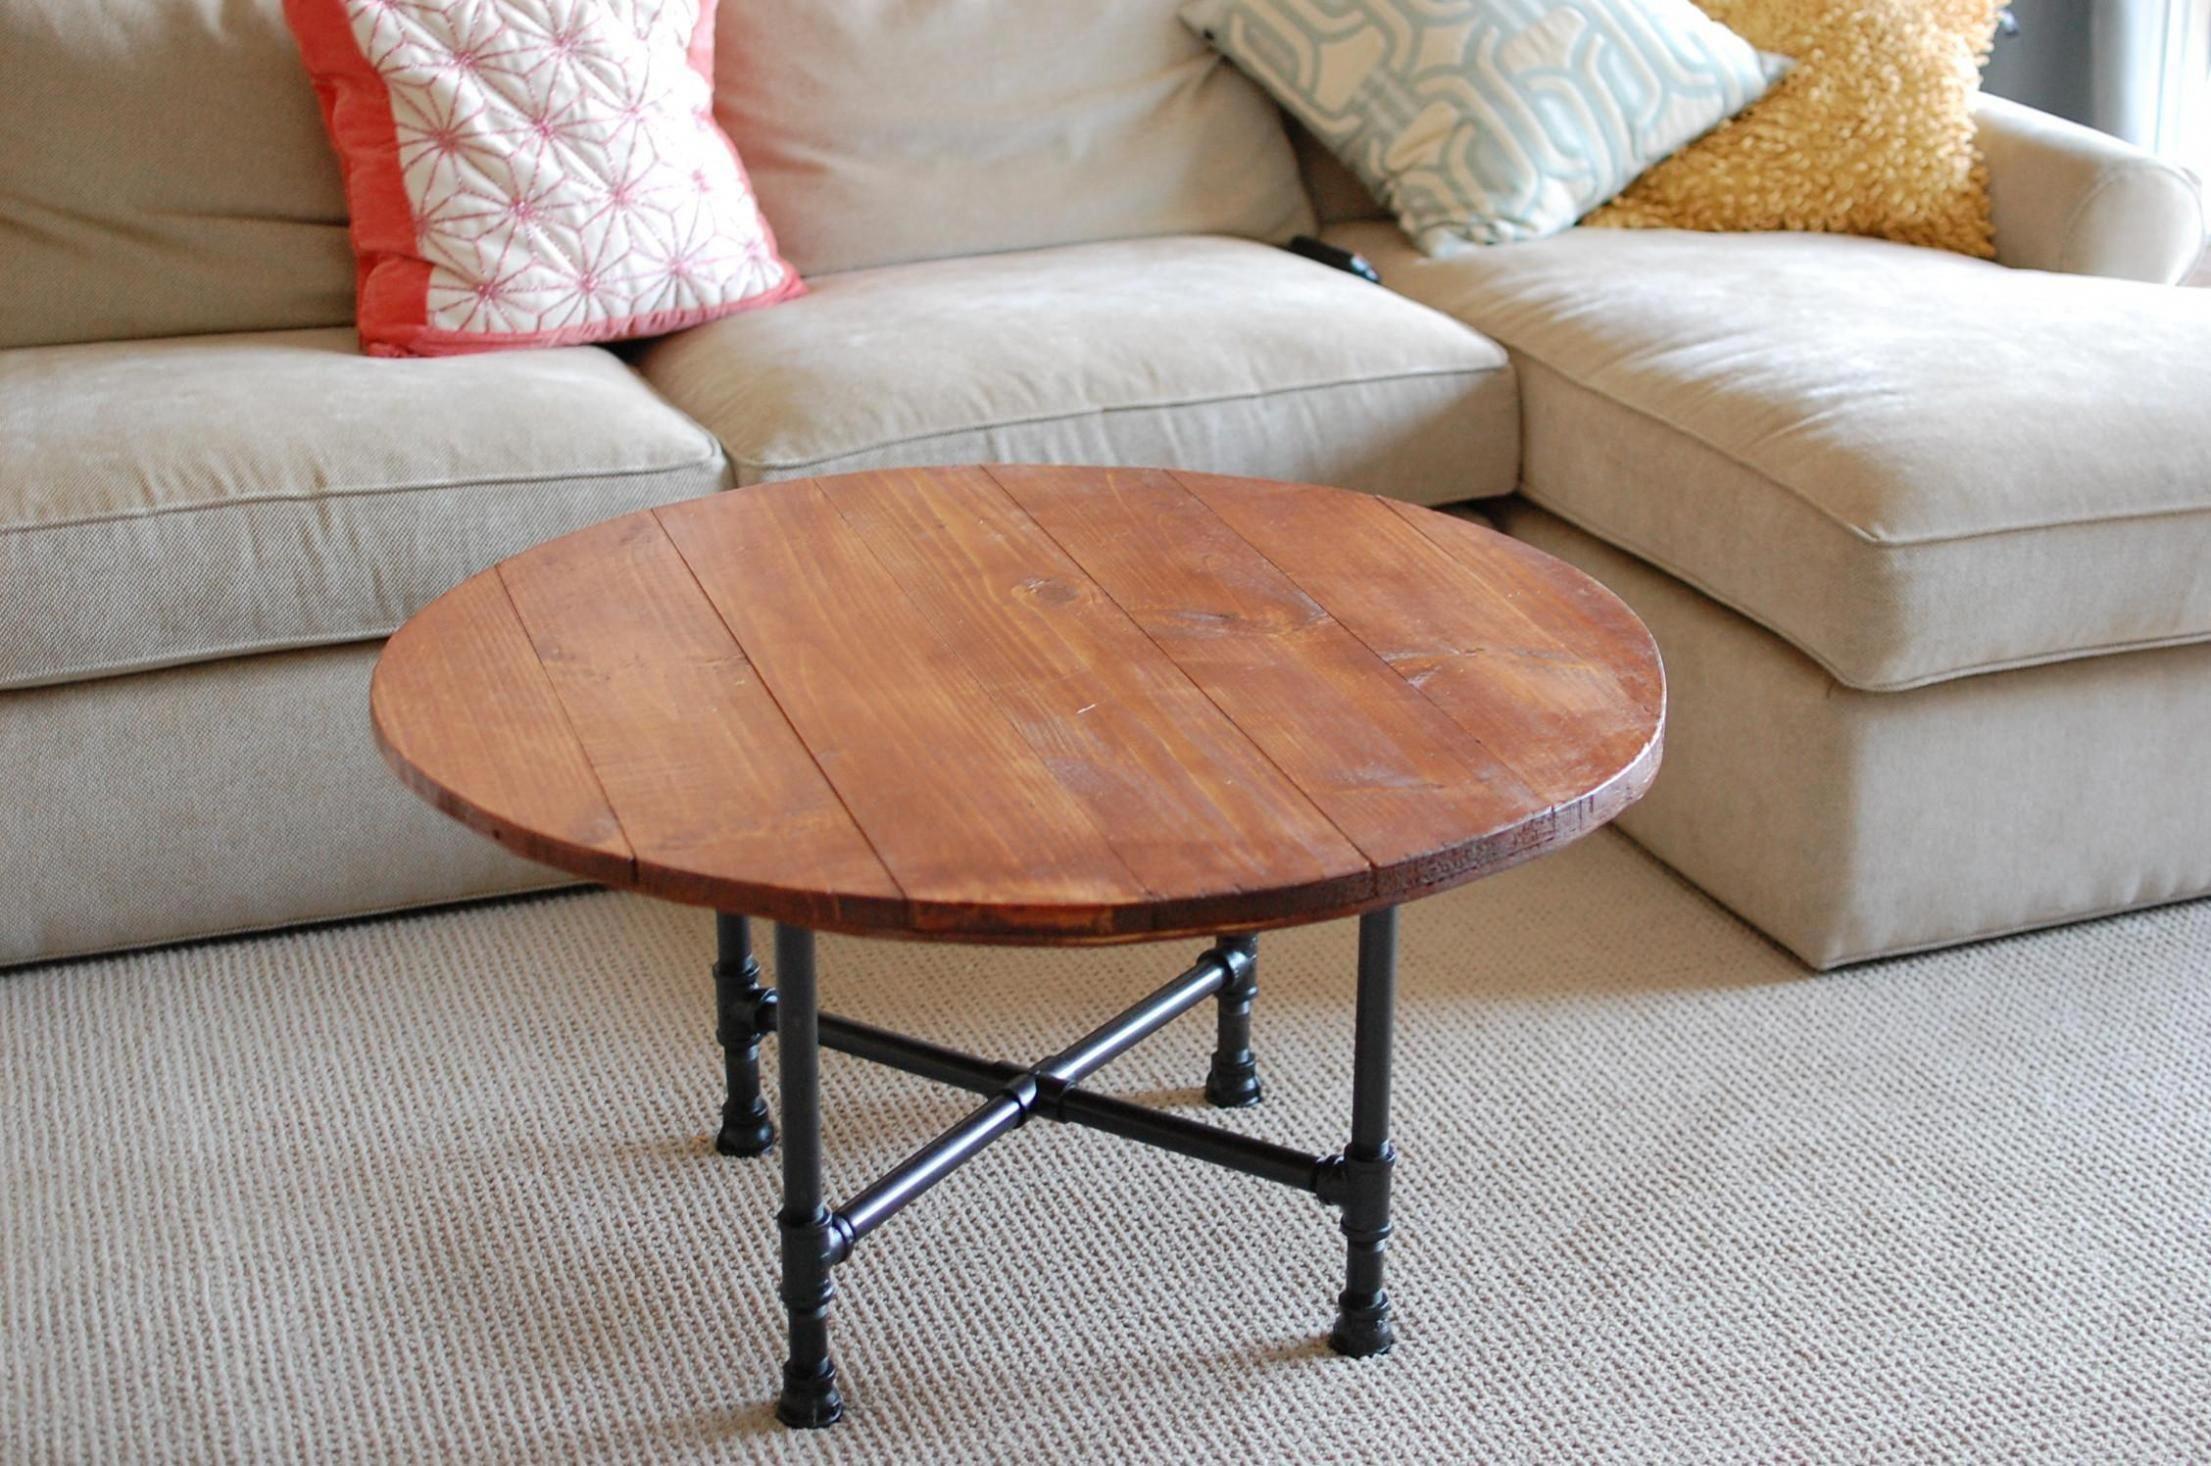 Rusticwoodcoffeetable Wood Coffee Table Rustic Coffee Table Coffee Table Wood [ 1466 x 2211 Pixel ]